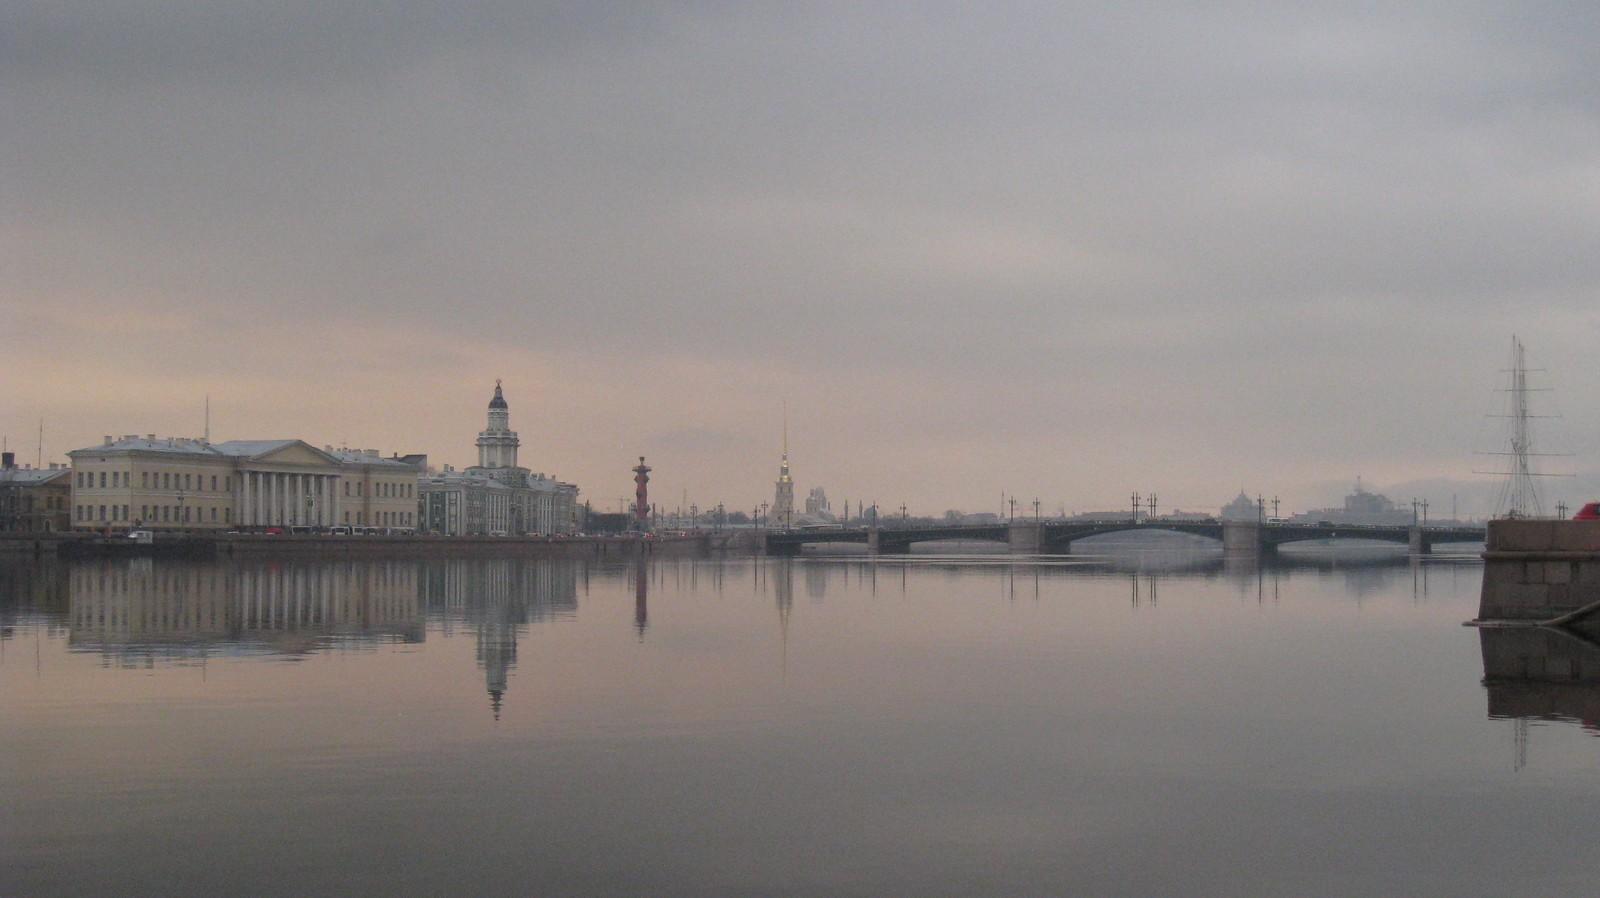 St.Petersburg, Russia | Петербург, Россия